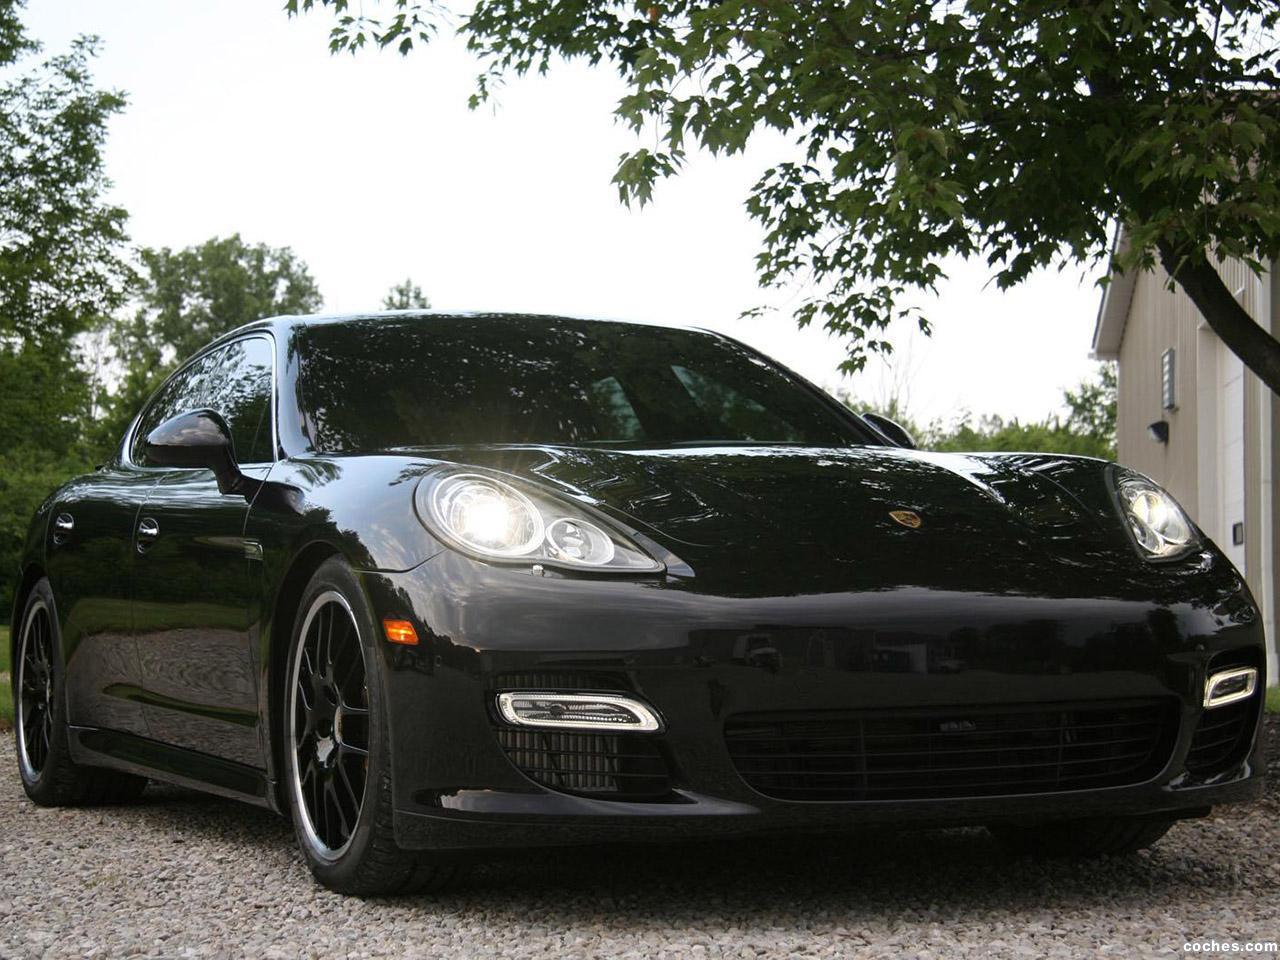 Foto 1 de Porsche Switzer Panamera Turbo 2011